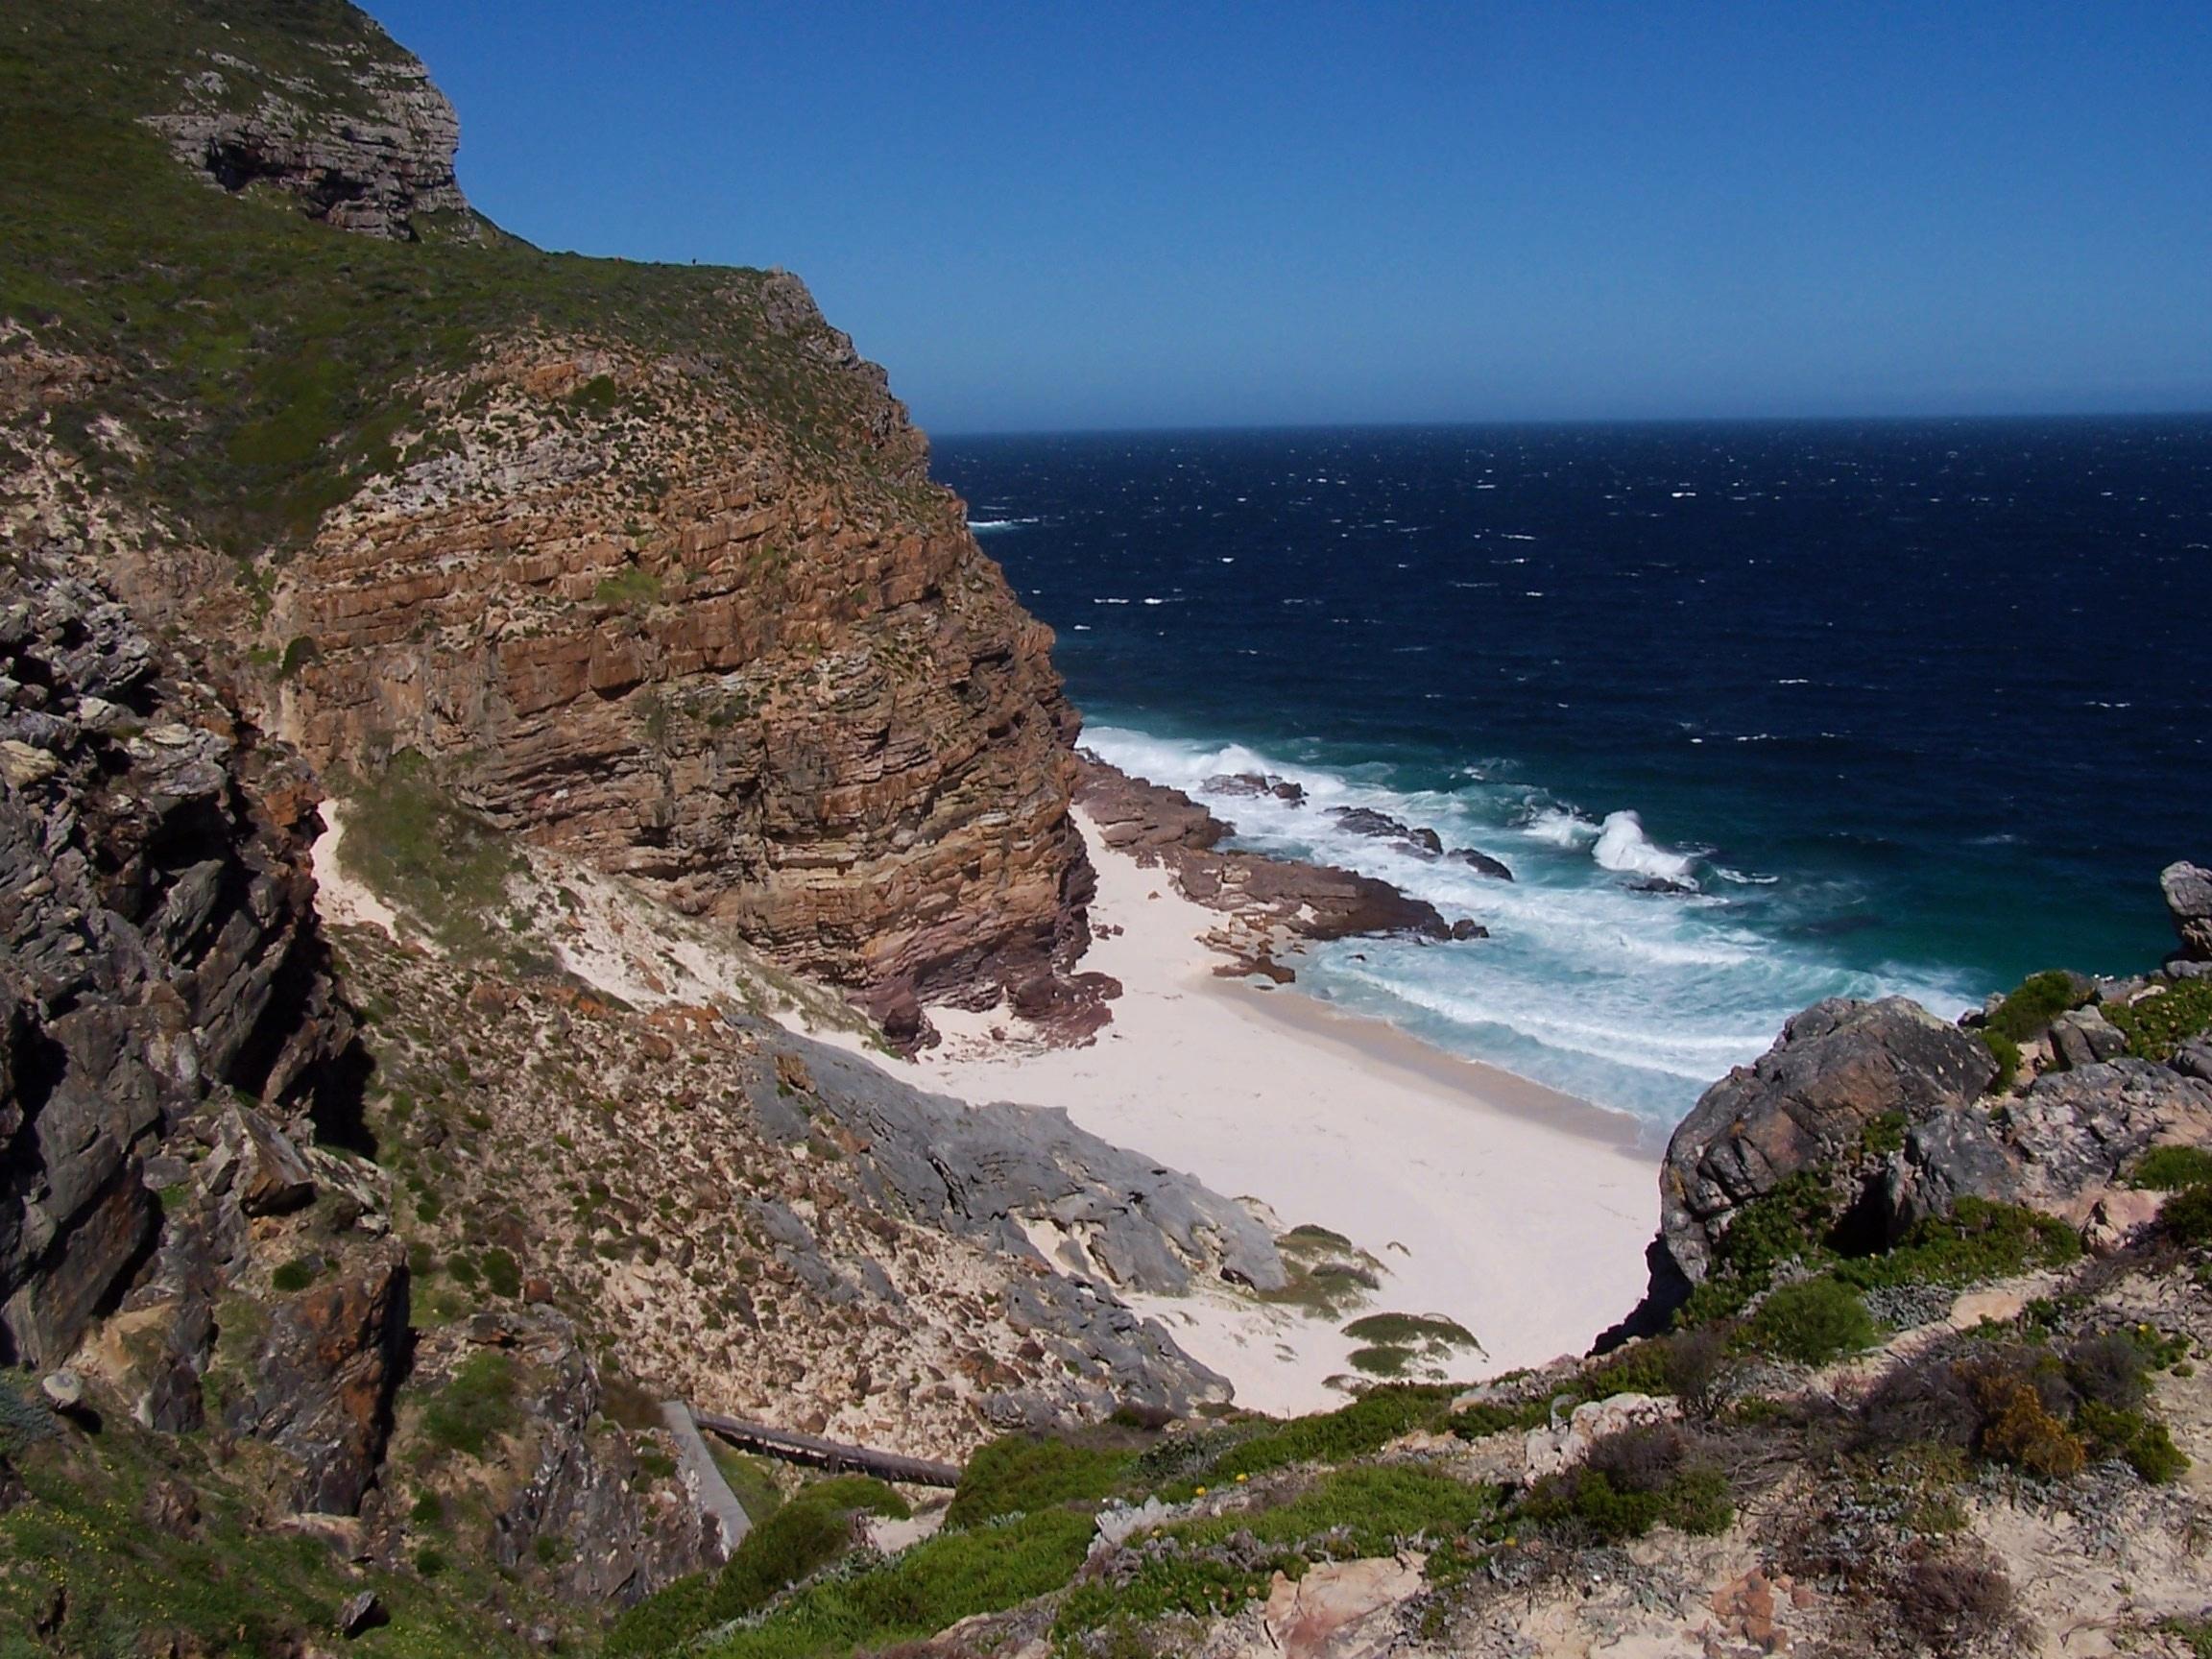 Free Images : beach, sea, coast, rock, ocean, shore